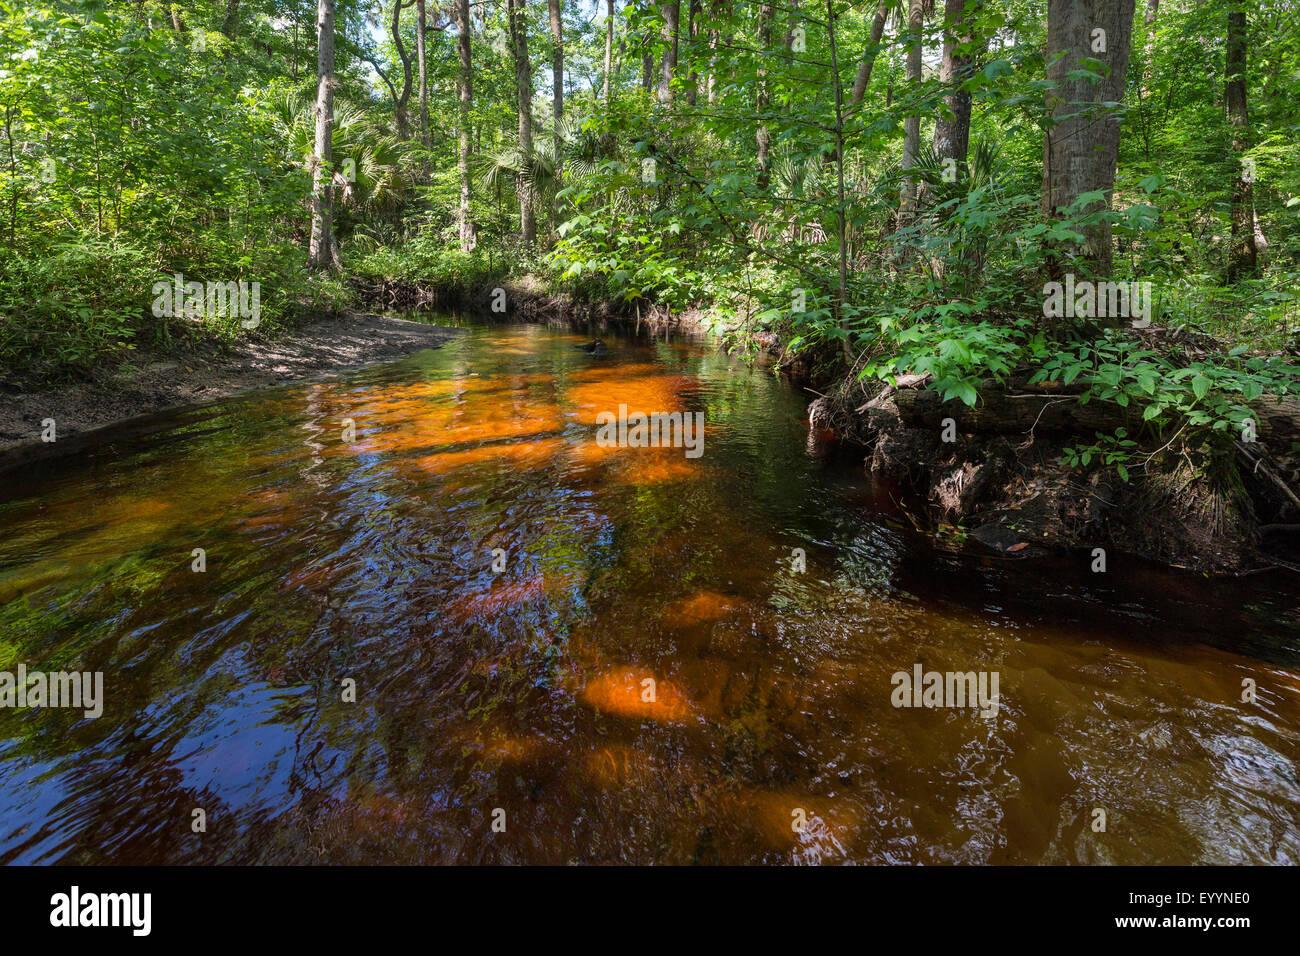 blackwater river with tropical vegetation, USA, Florida, Reedy Creek, Kissimmee - Stock Image